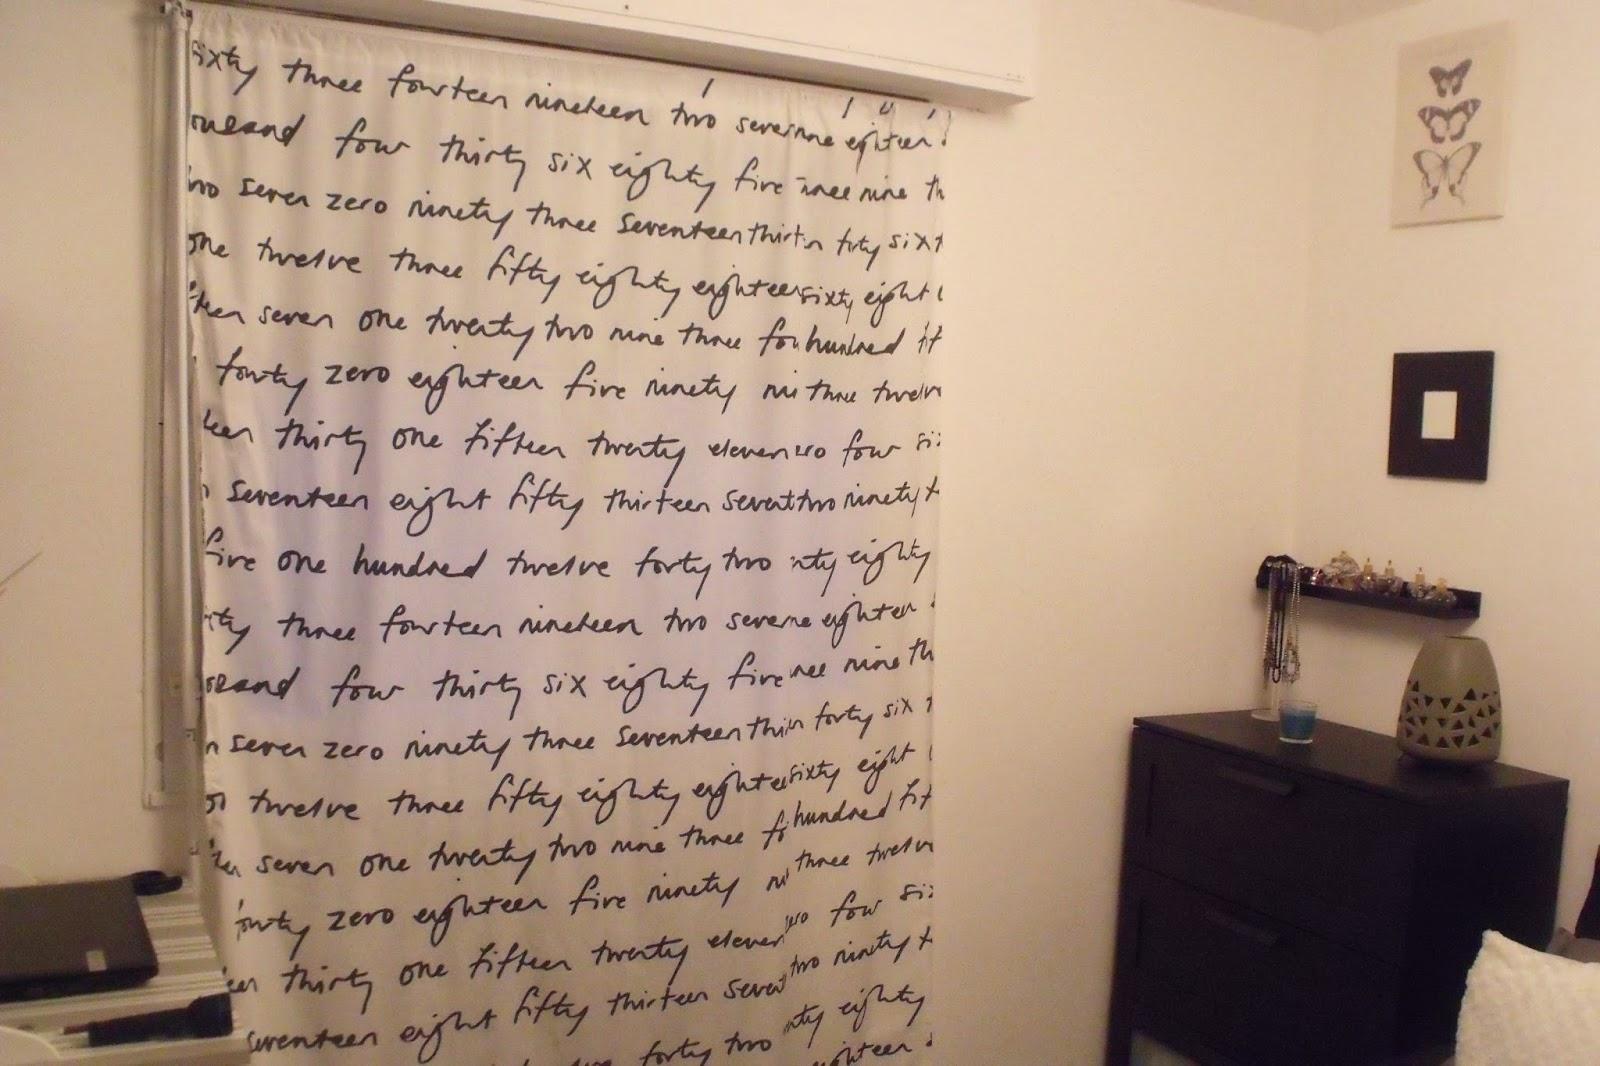 Lili joue maman bricole coudre un rideau avec du tissus ikea - Tringle rideau mur a mur ...